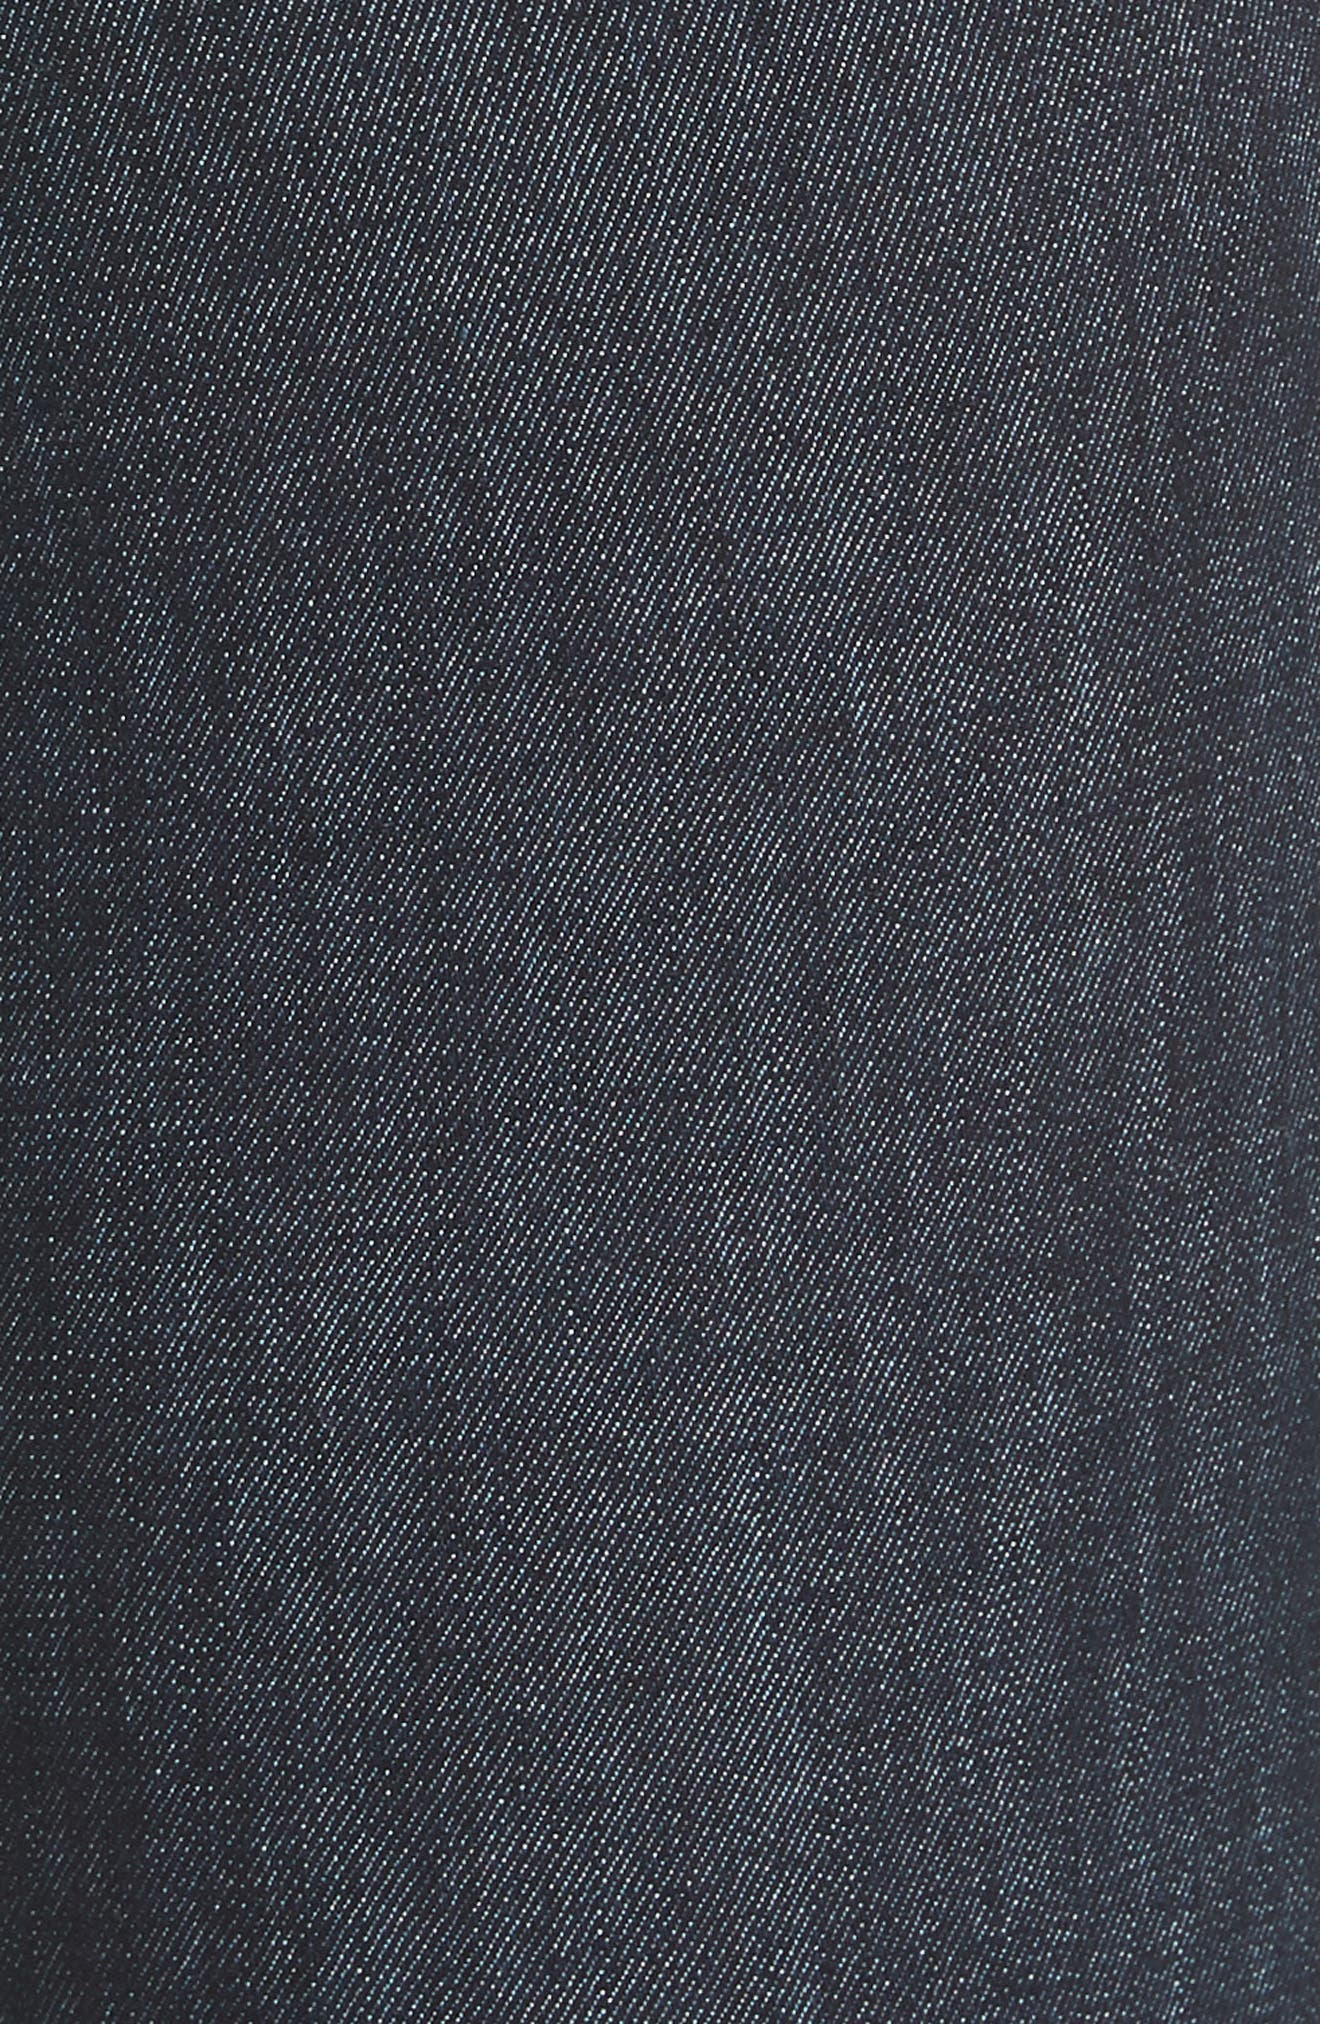 High Waist Skinny Jeans,                             Alternate thumbnail 6, color,                             INDIGO